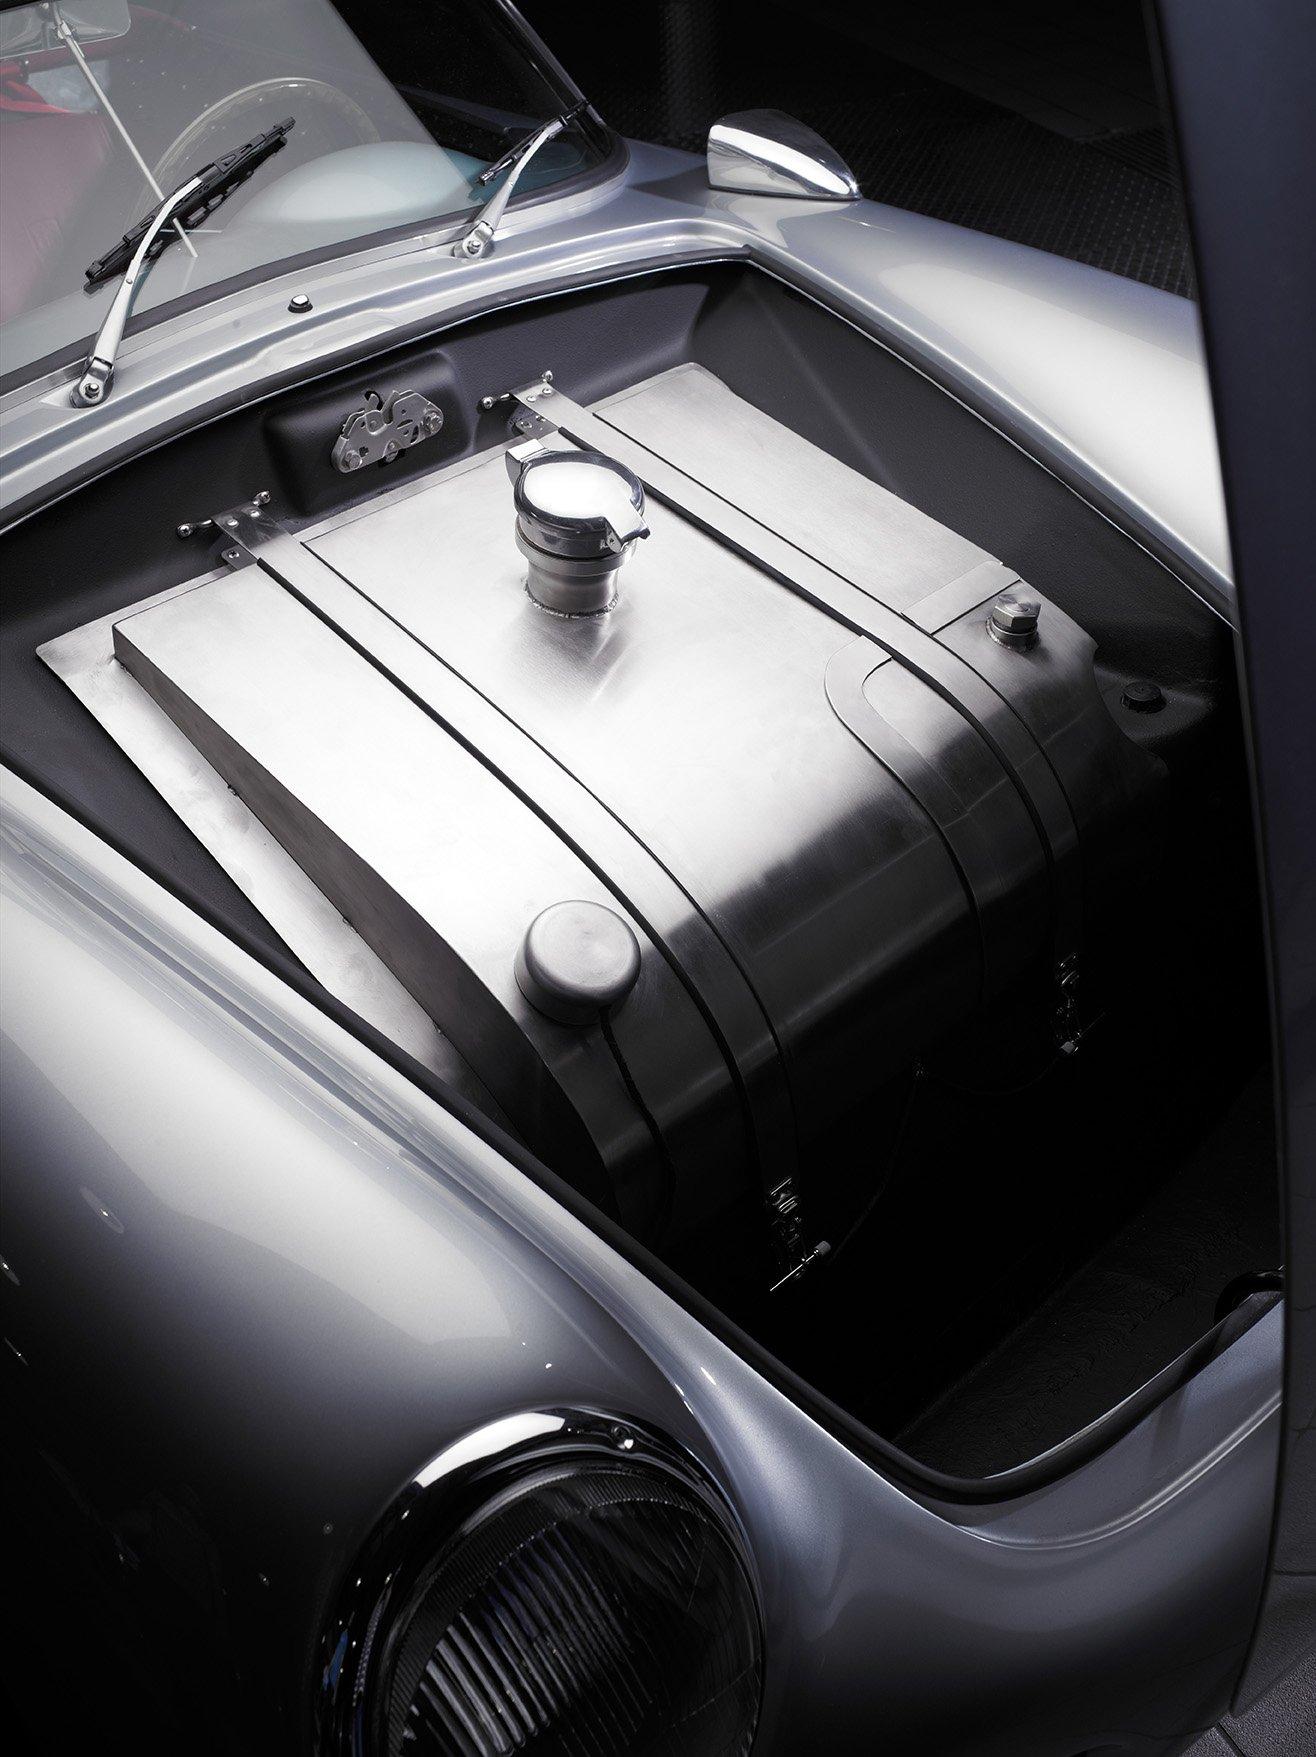 RCH 550 Fuel Tank